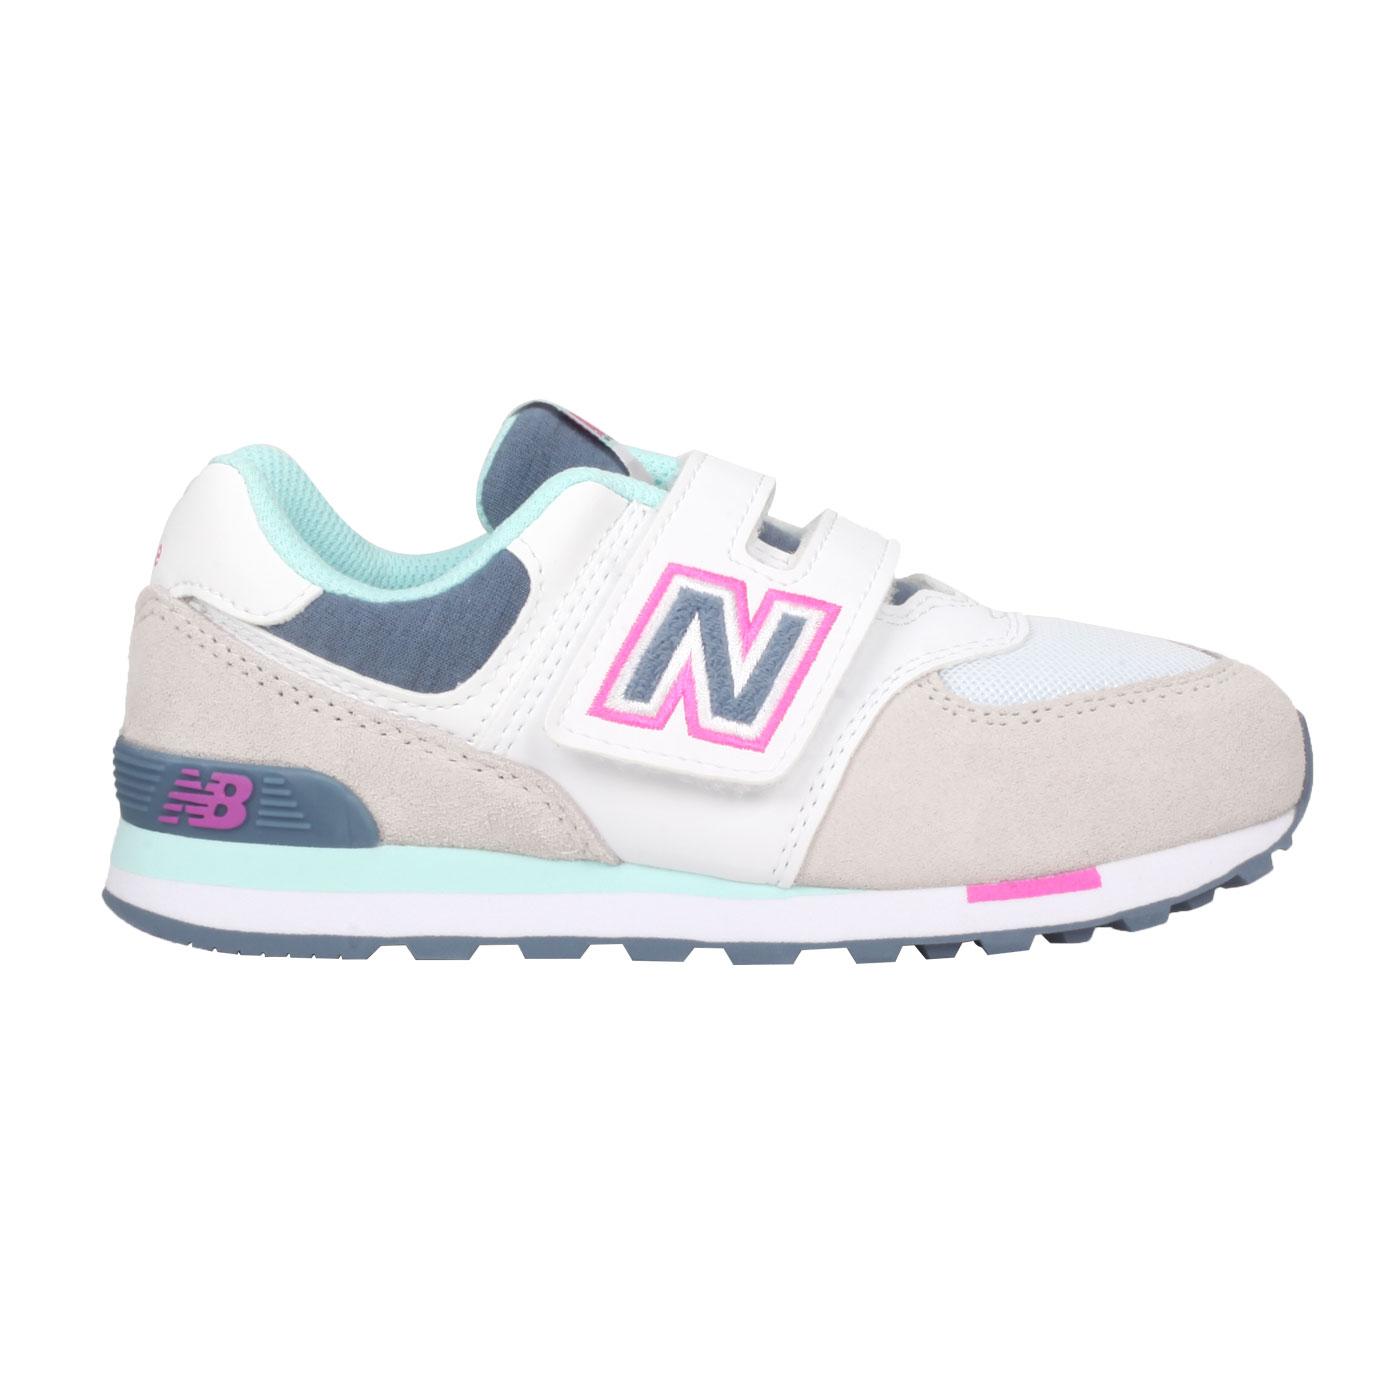 NEW BALANCE 中童運動休閒鞋-WIDE YV574NLH